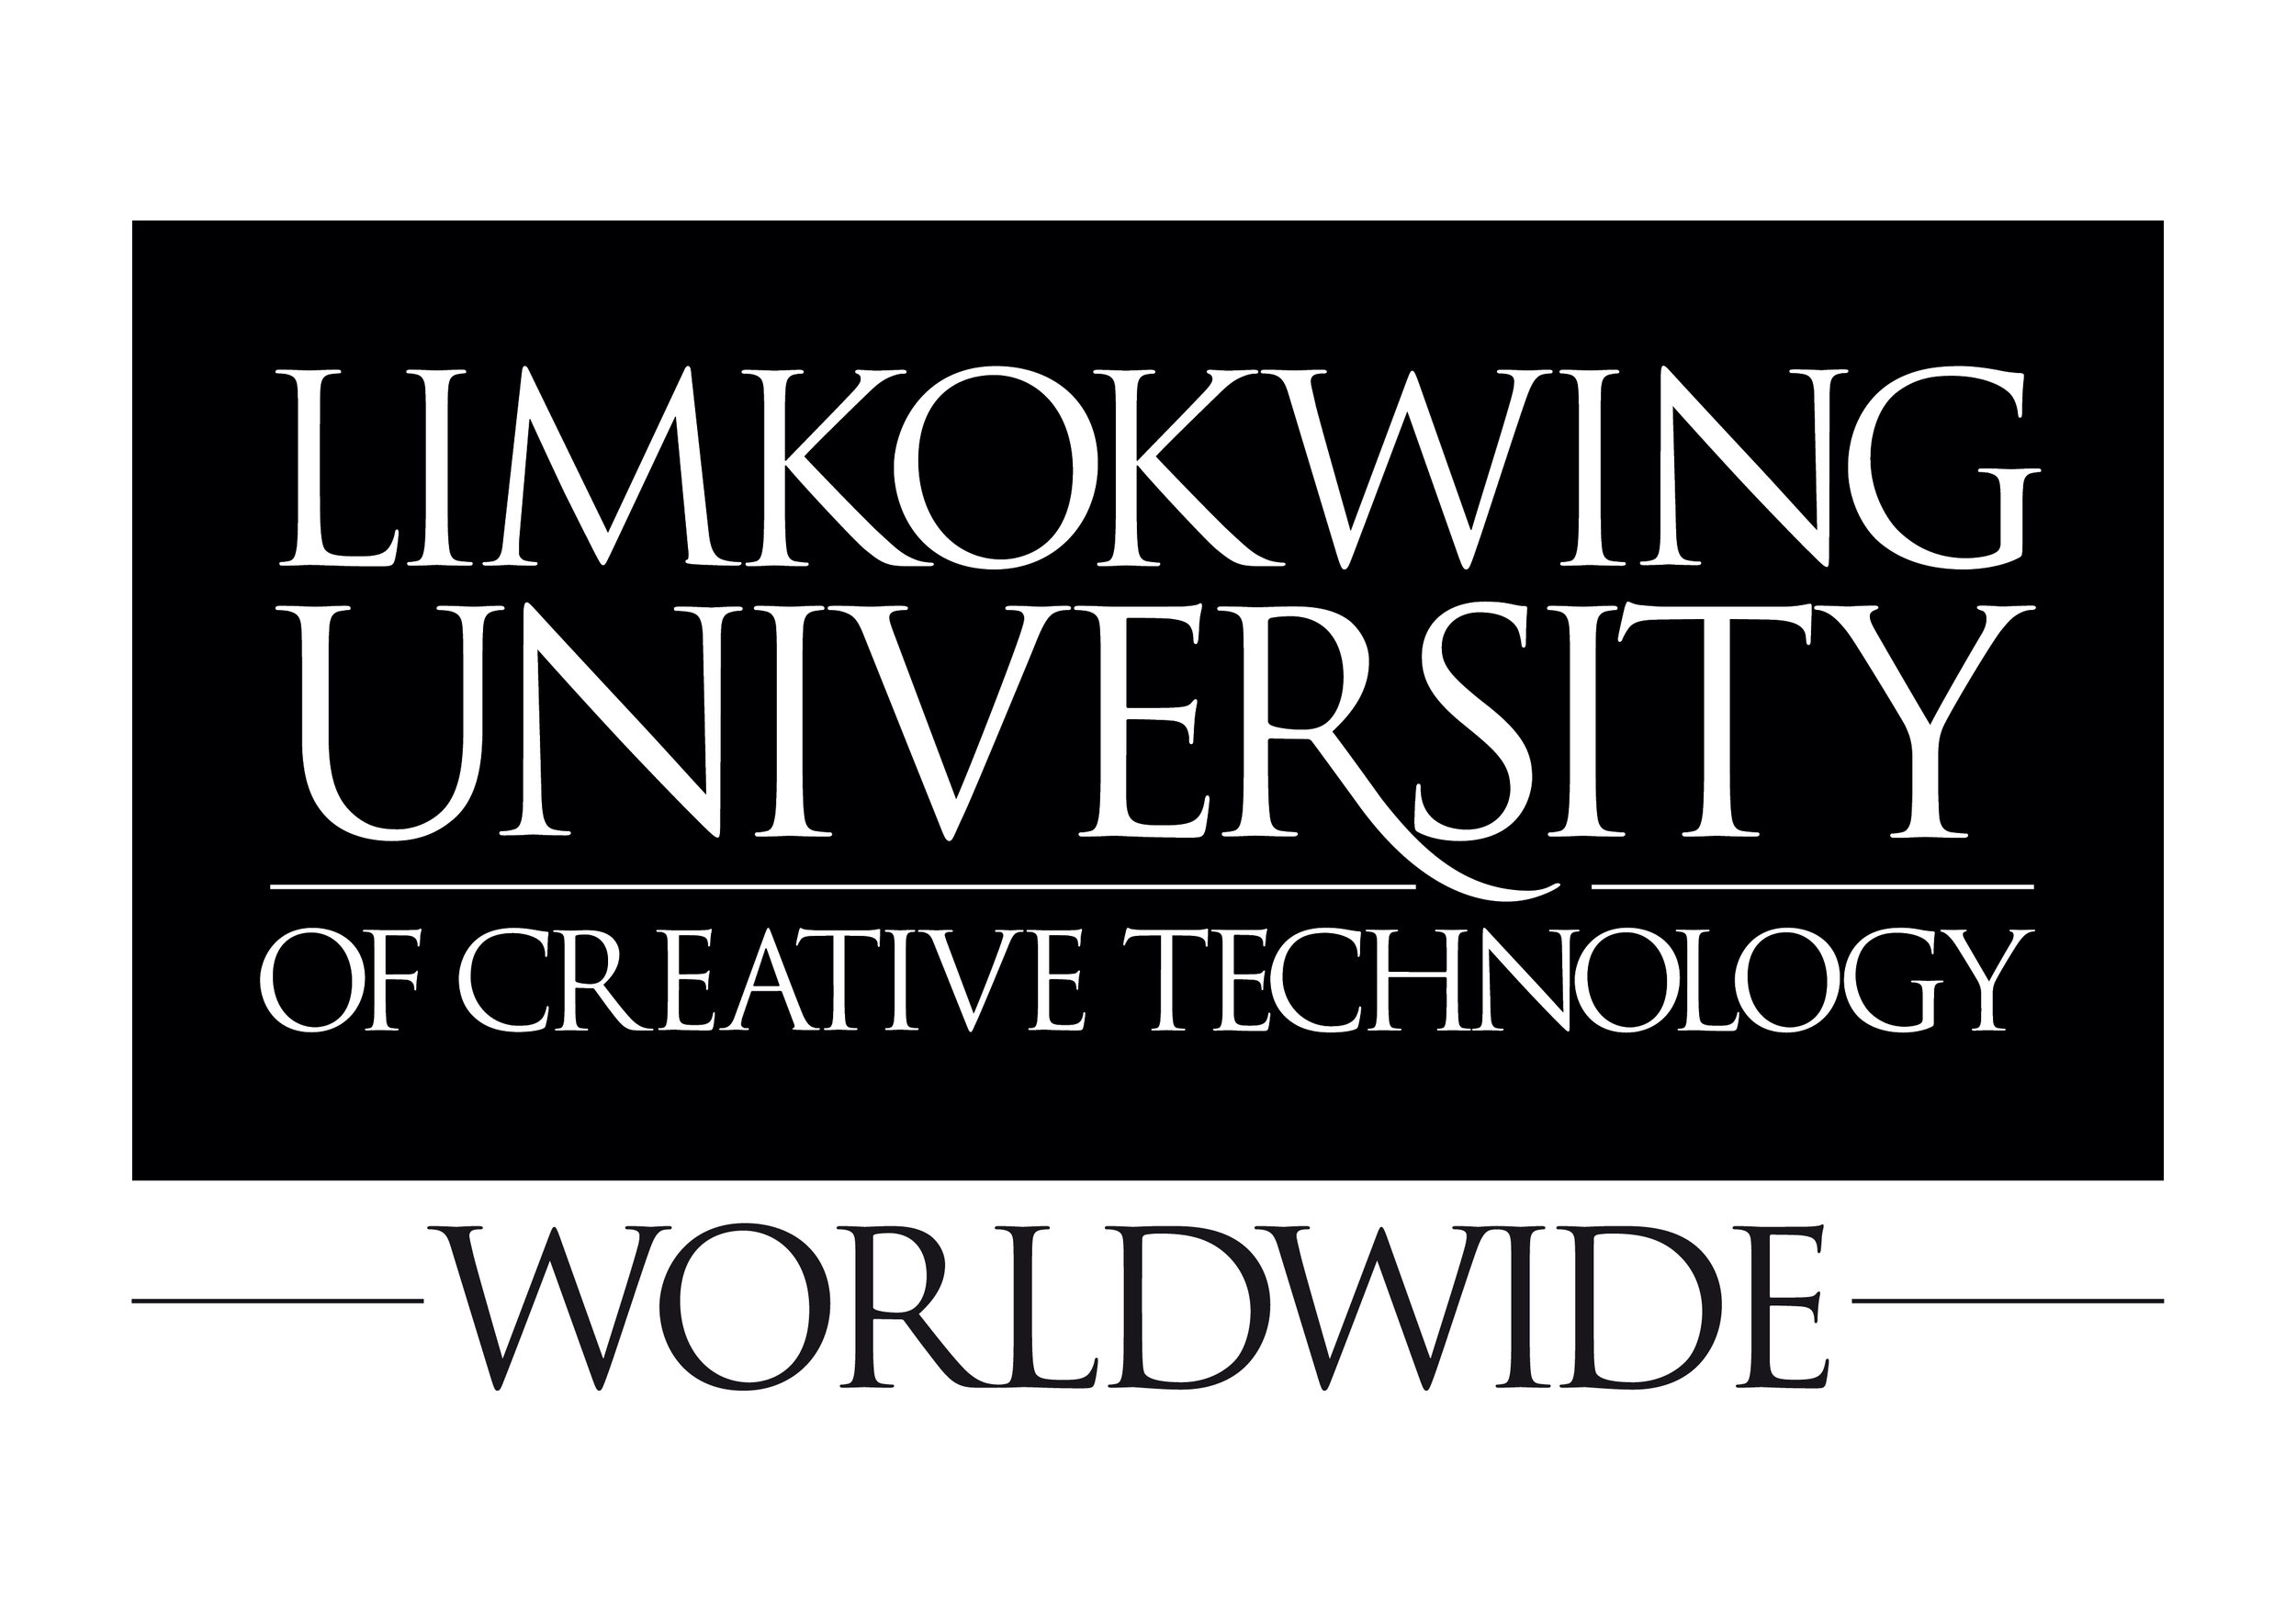 limkokwing_worldwide_logo-01.jpg